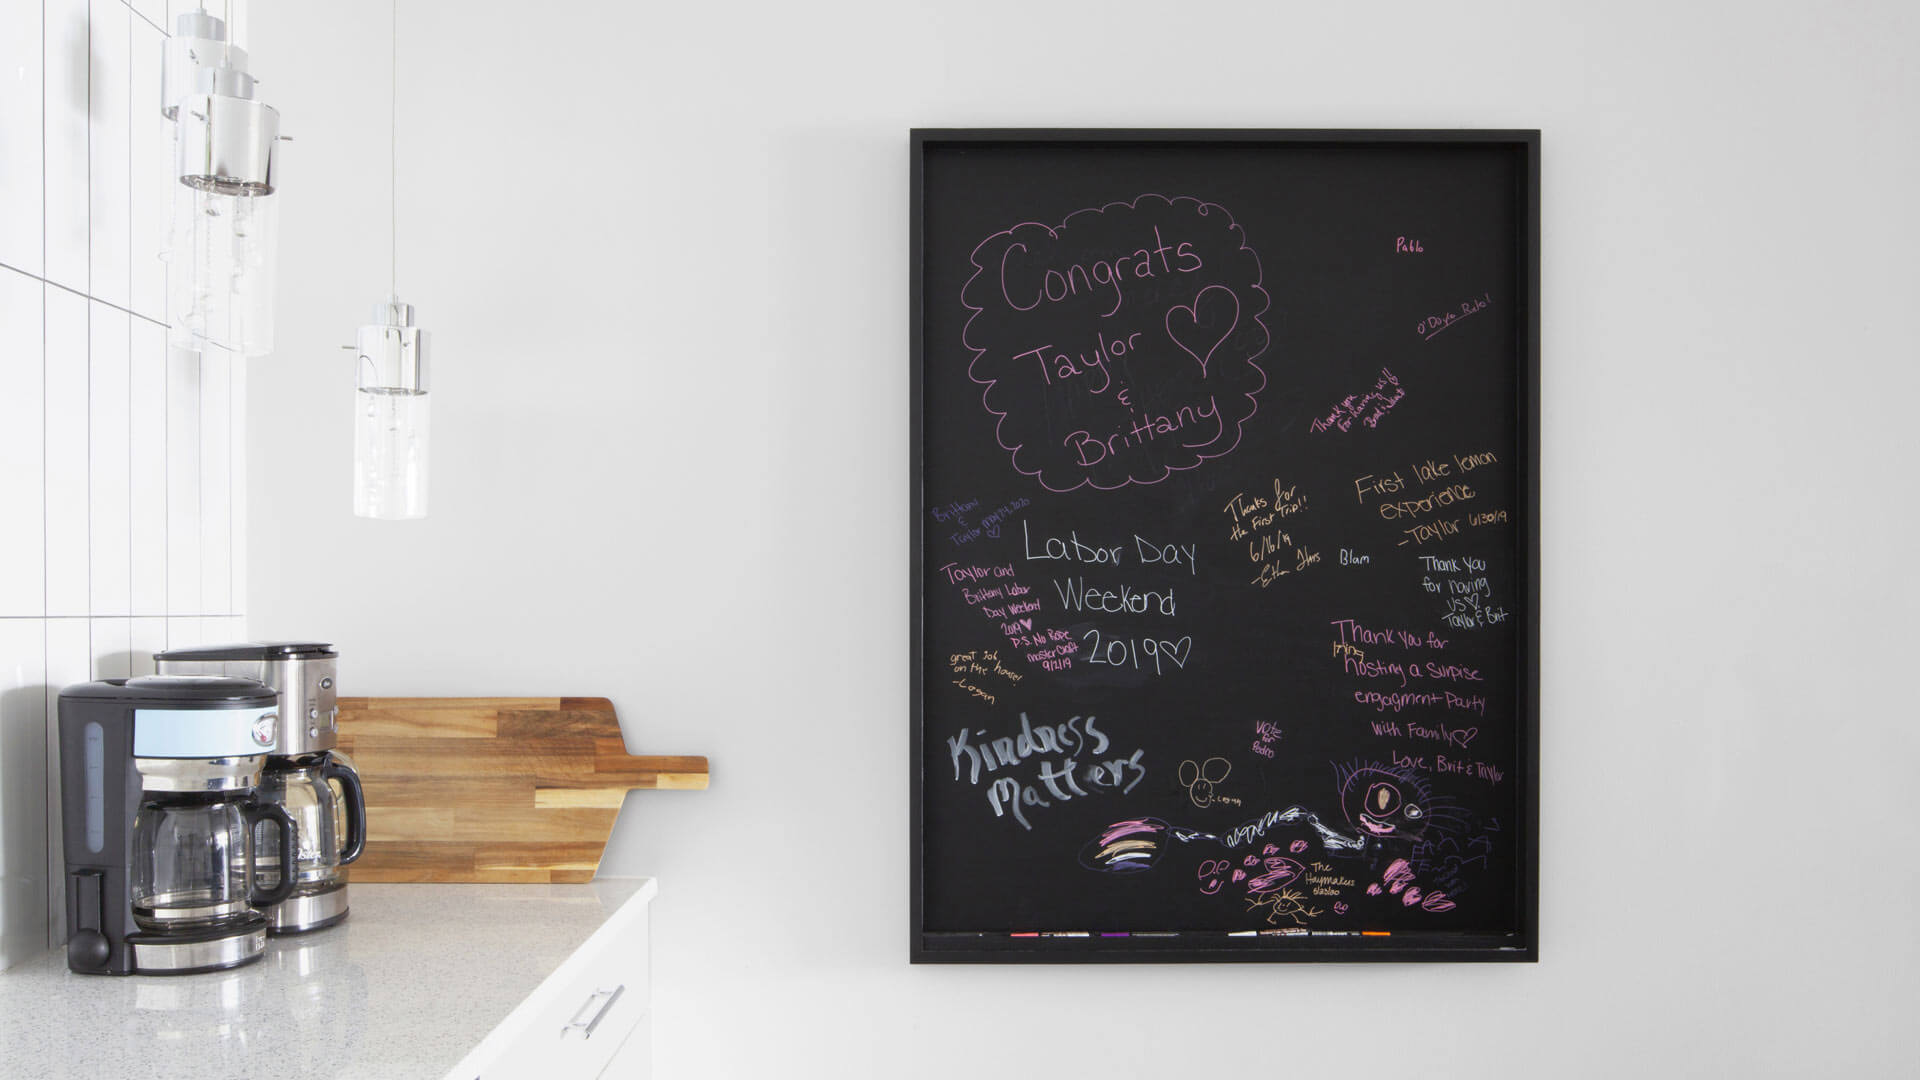 Kitchen Chalkboard + Beverage Station - Lakeside Modern Cottage (H-LODGE) - Unionville, Indiana, Lake Lemon